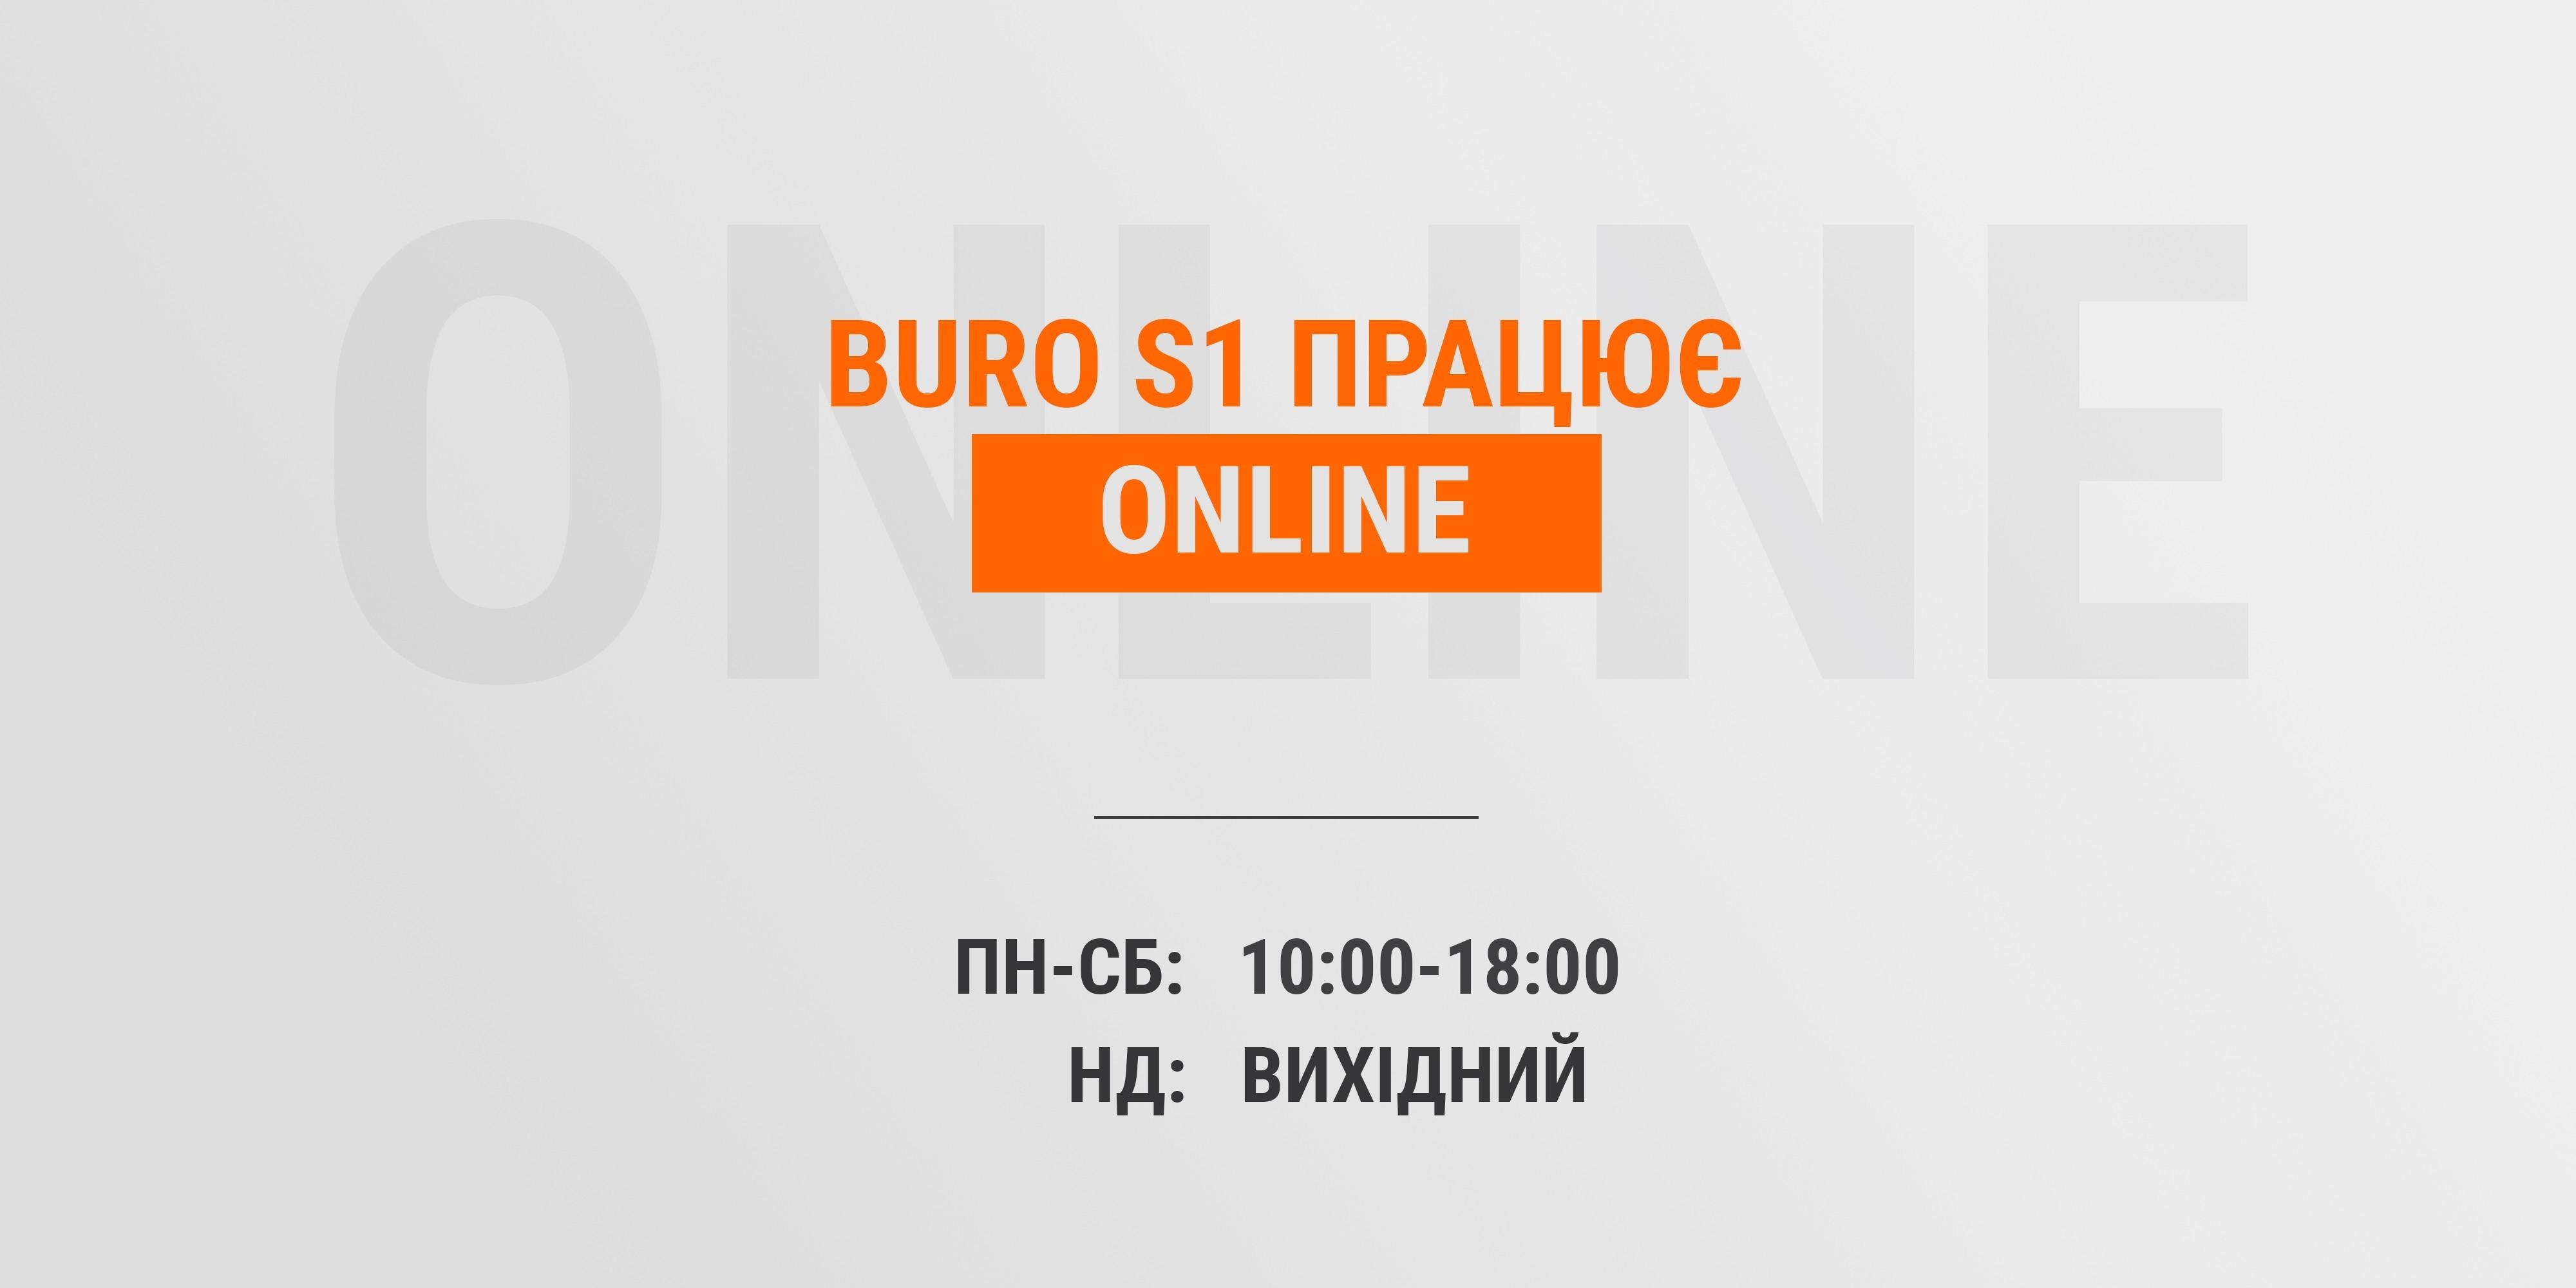 Buro S1 працює online